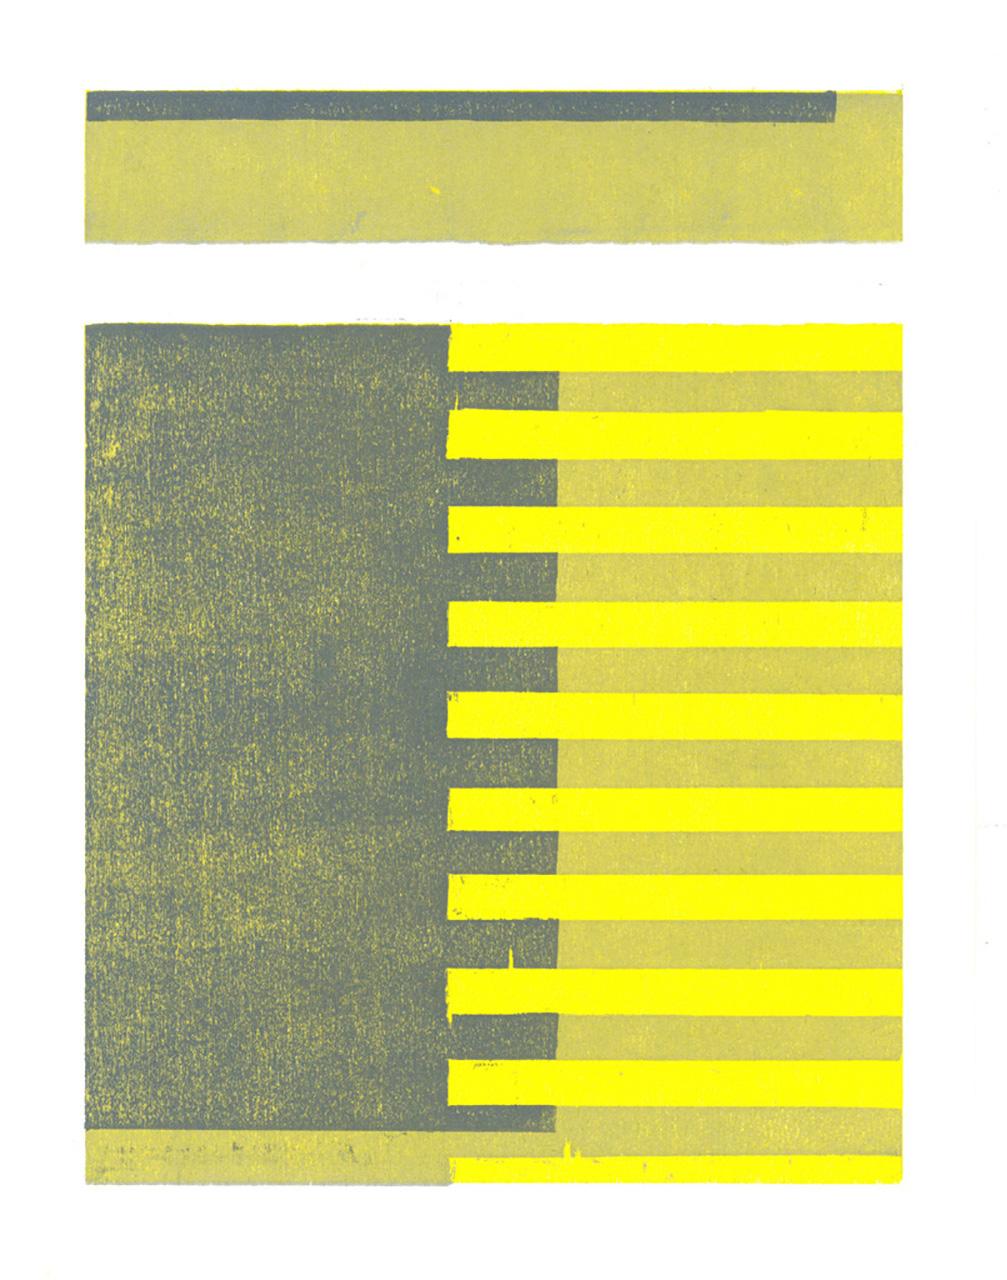 "GreY, 2015, relief woodcut, 15"" x 11"""